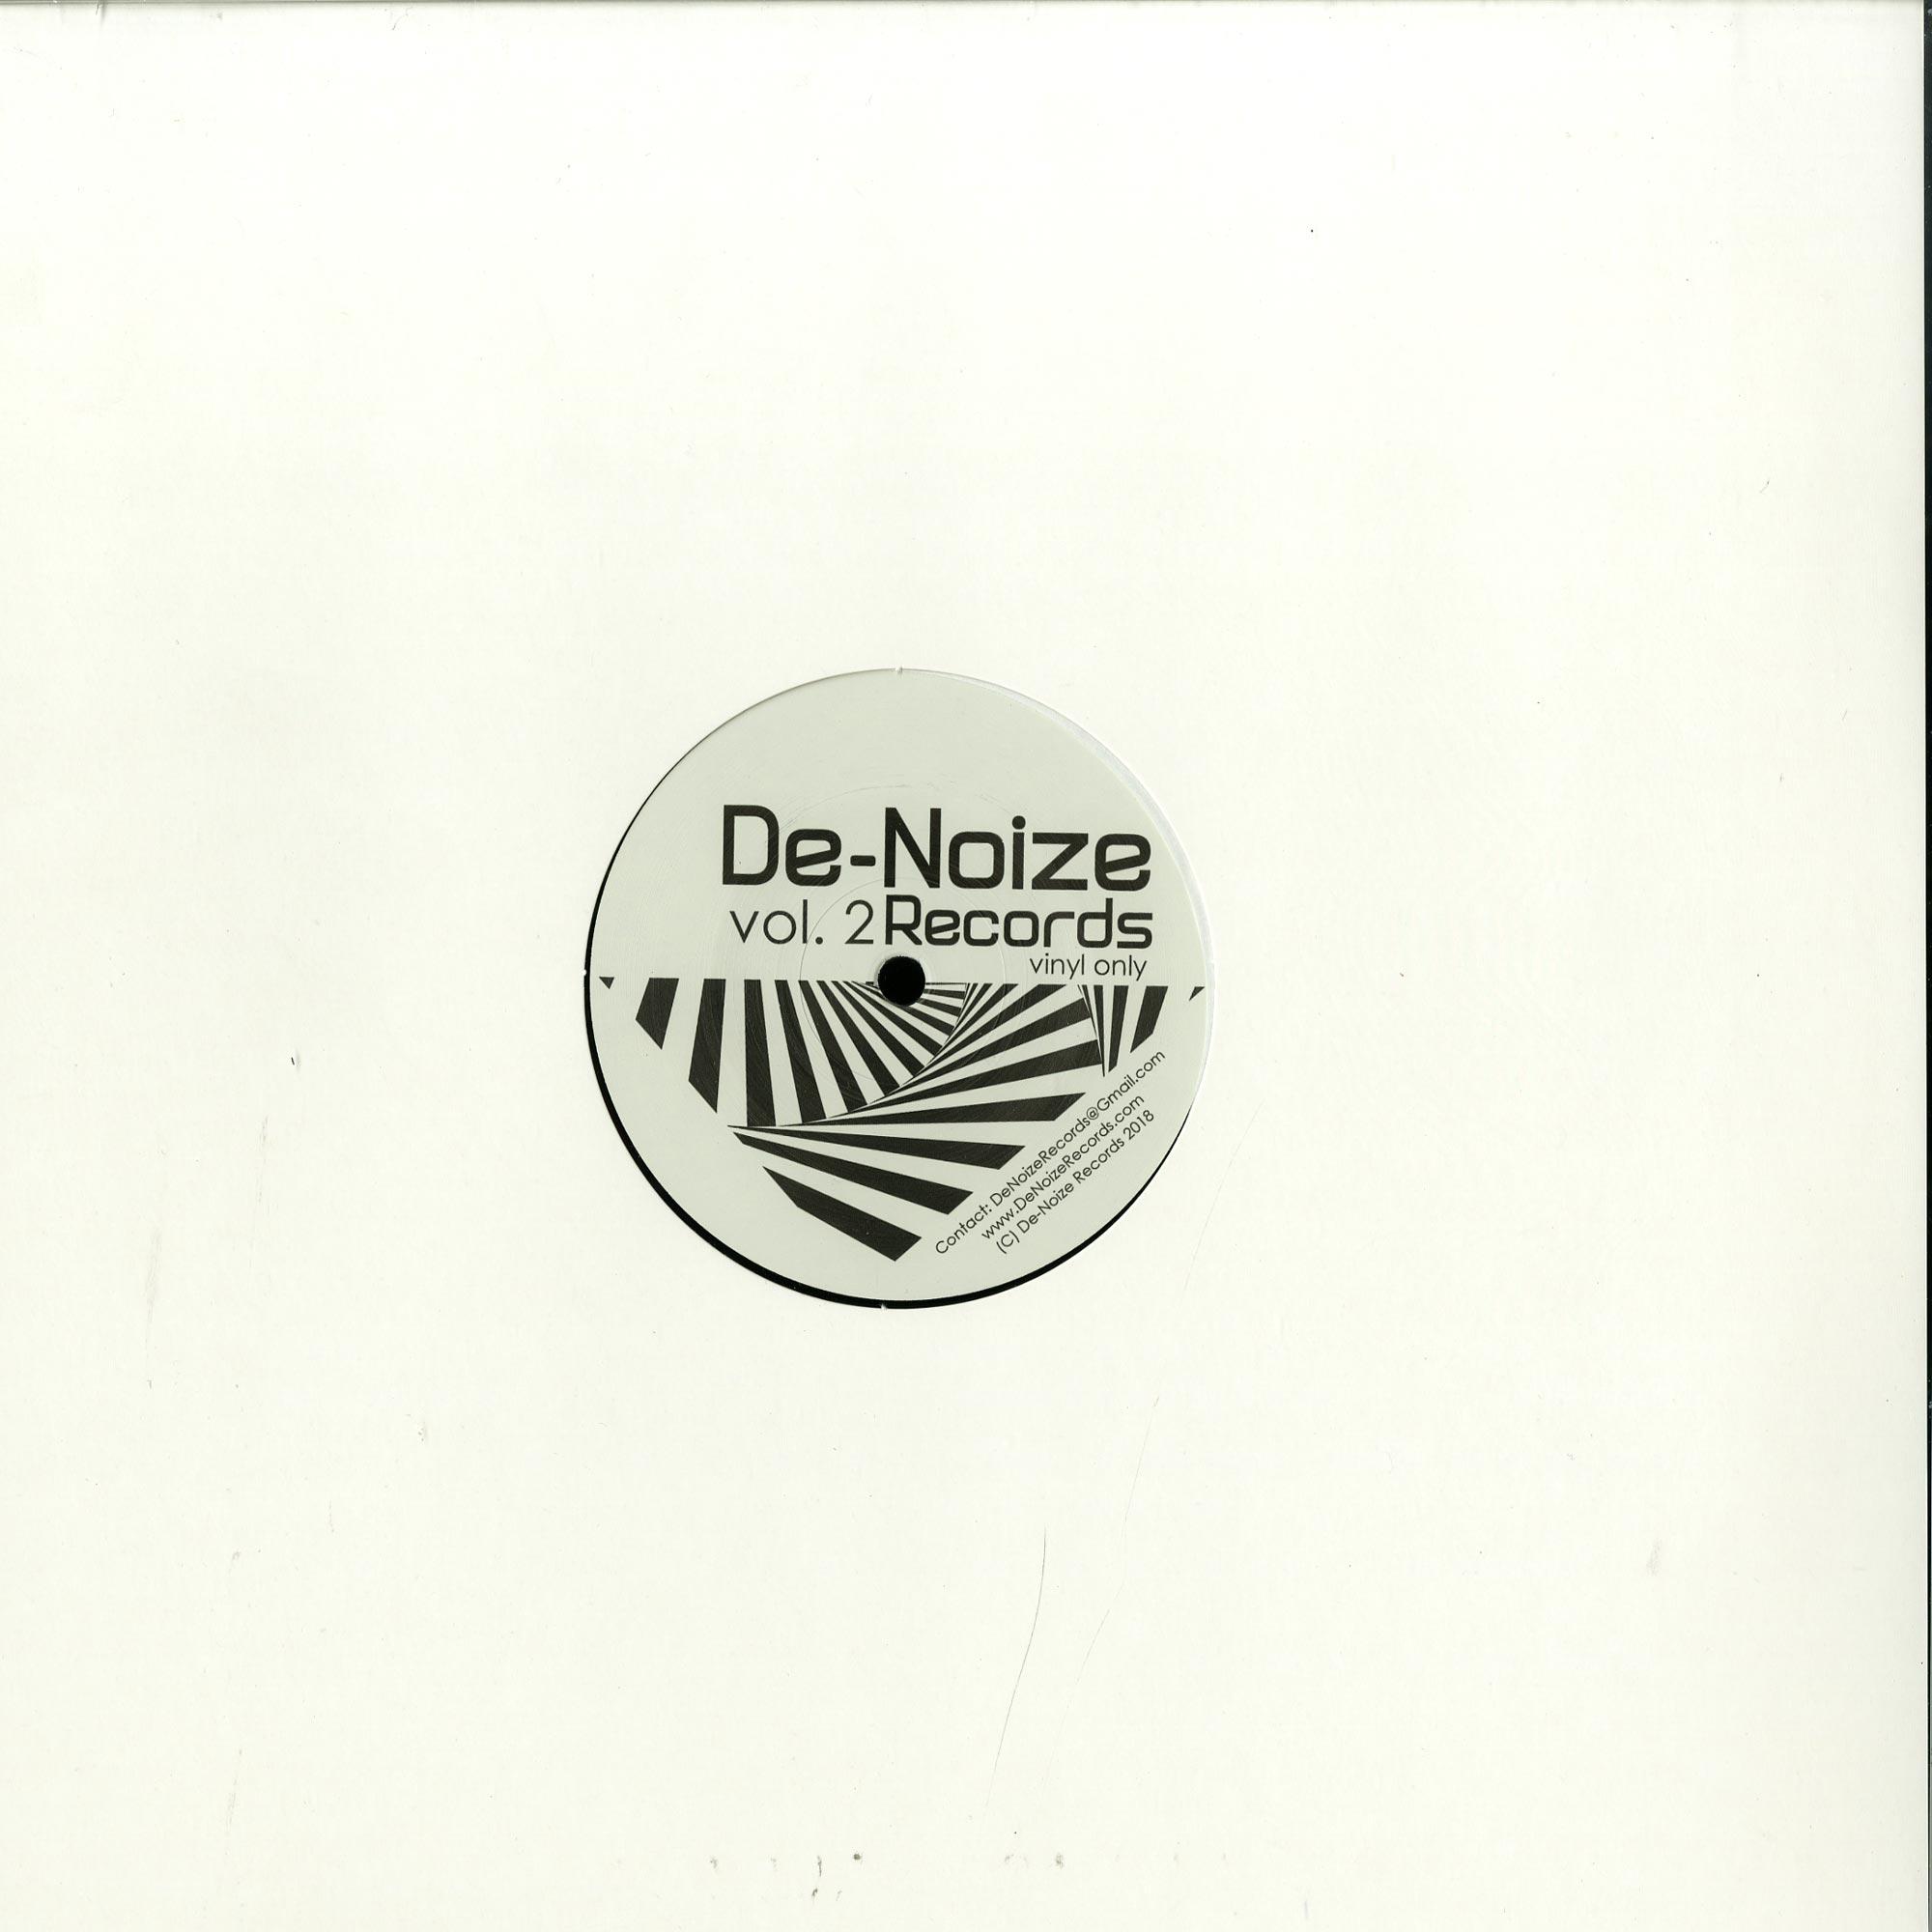 Malbetrieb, Audio KoDe, Paul Ursin - DE-NOIZE RECORDS VOLUME 2